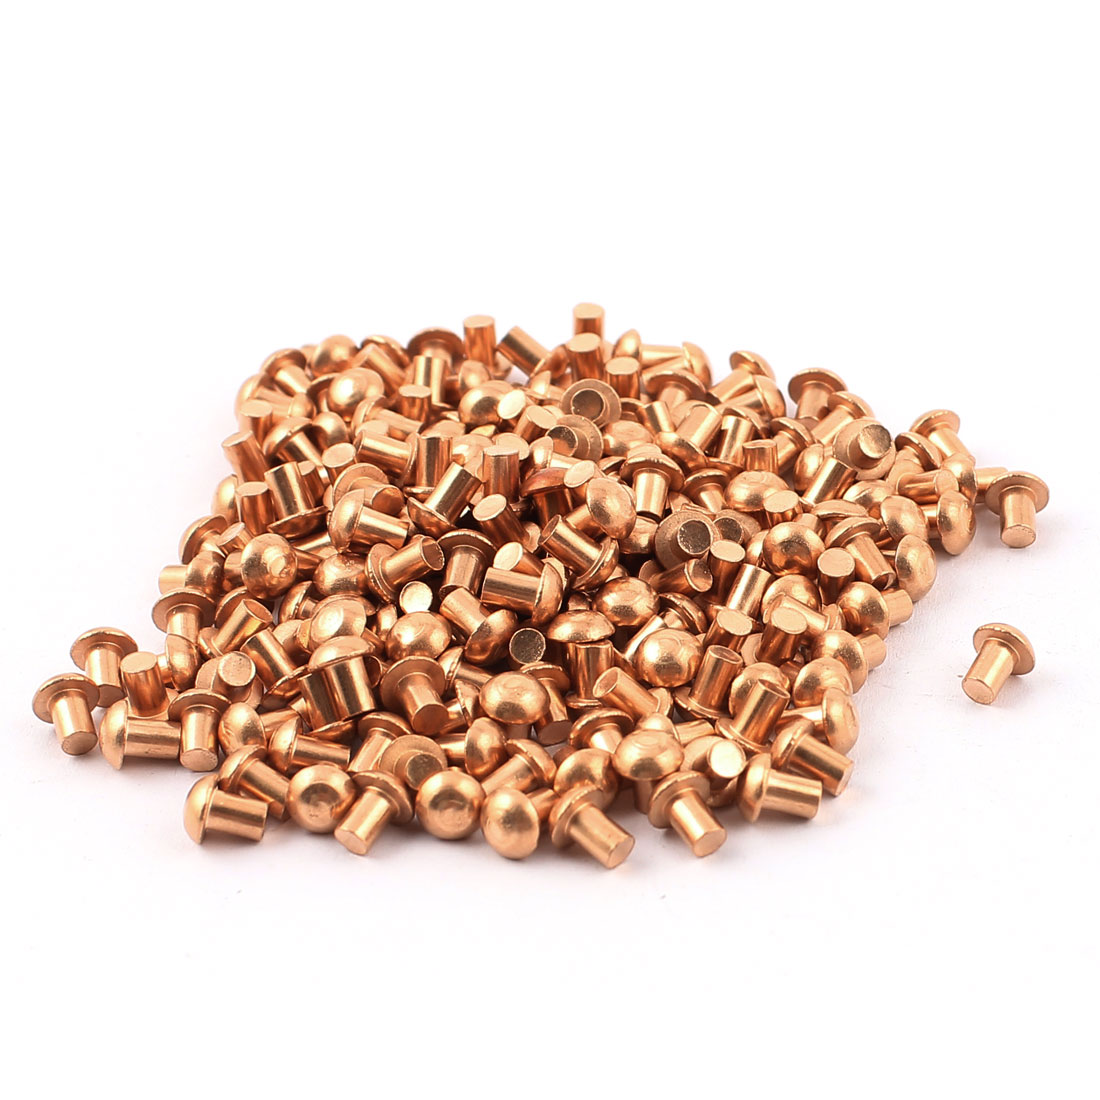 "200 Pcs 1/8"" x 5/32"" Round Head Copper Solid Rivets Fasteners"